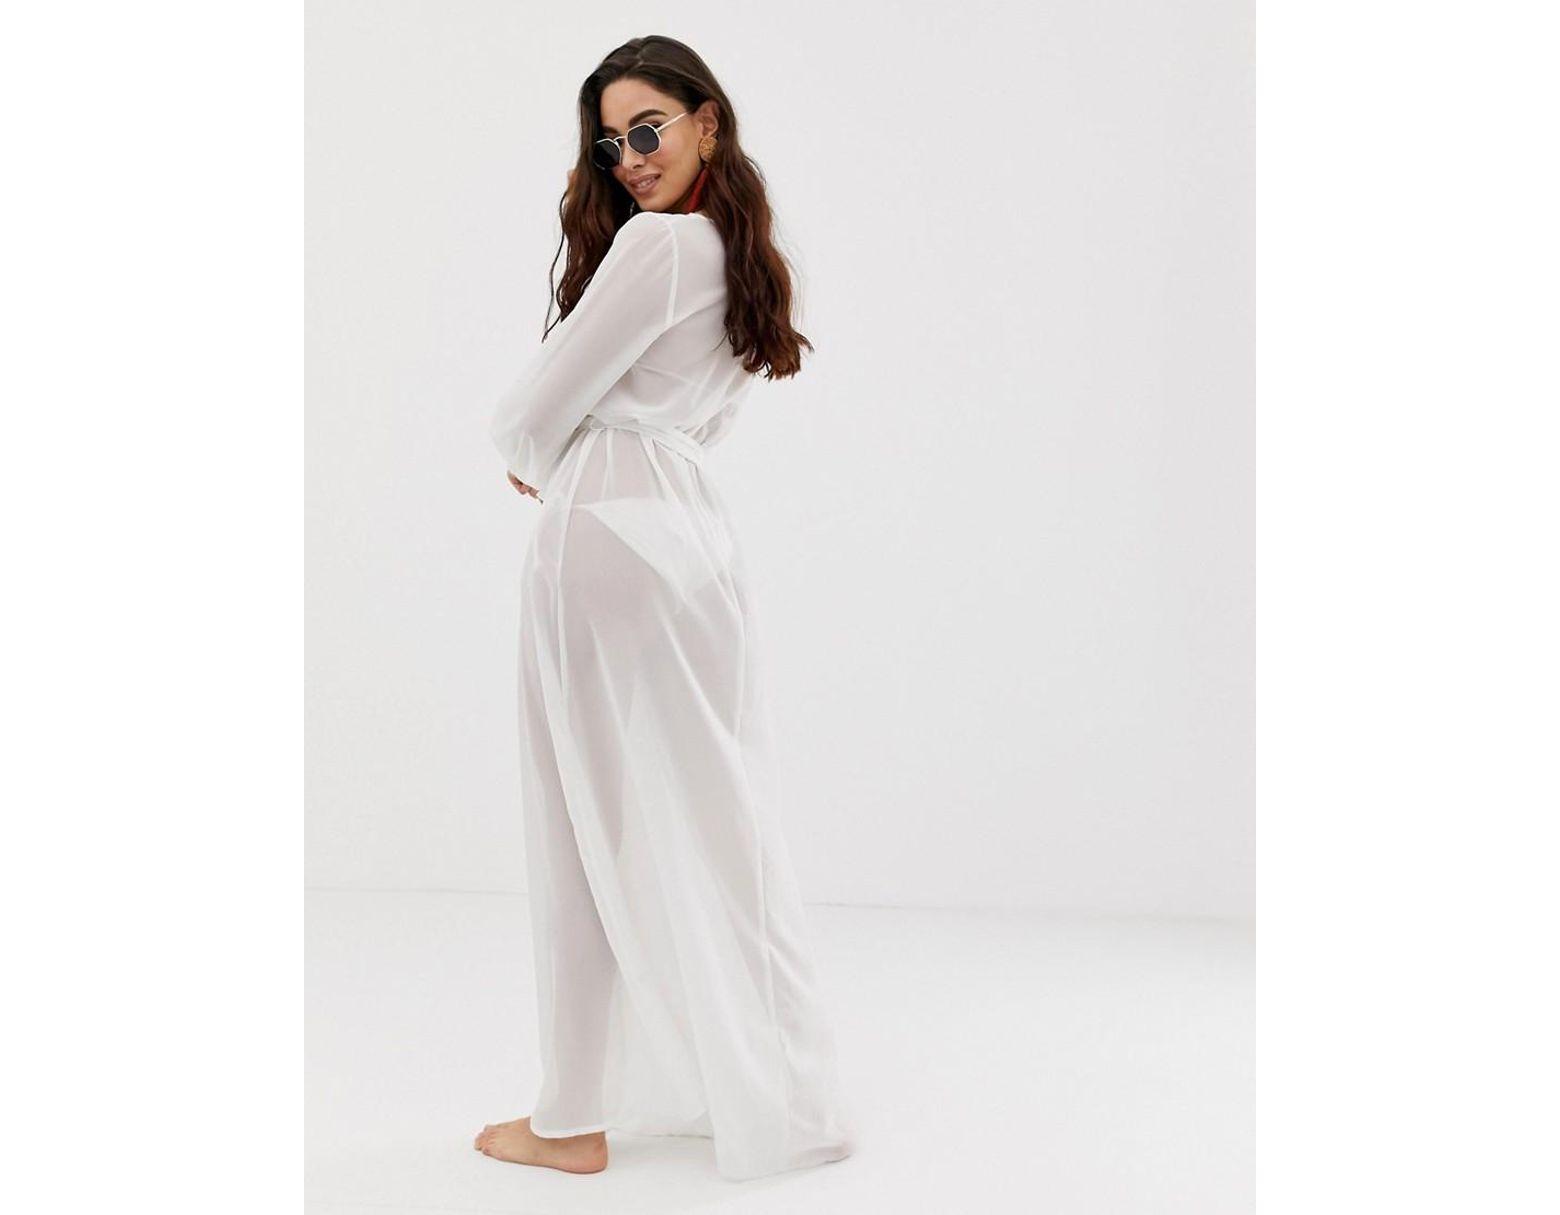 6f11dc54fe4 ASOS Recycled Long Sleeve Wrap Tie Chiffon Maxi Beach Kimono In White in  White - Lyst